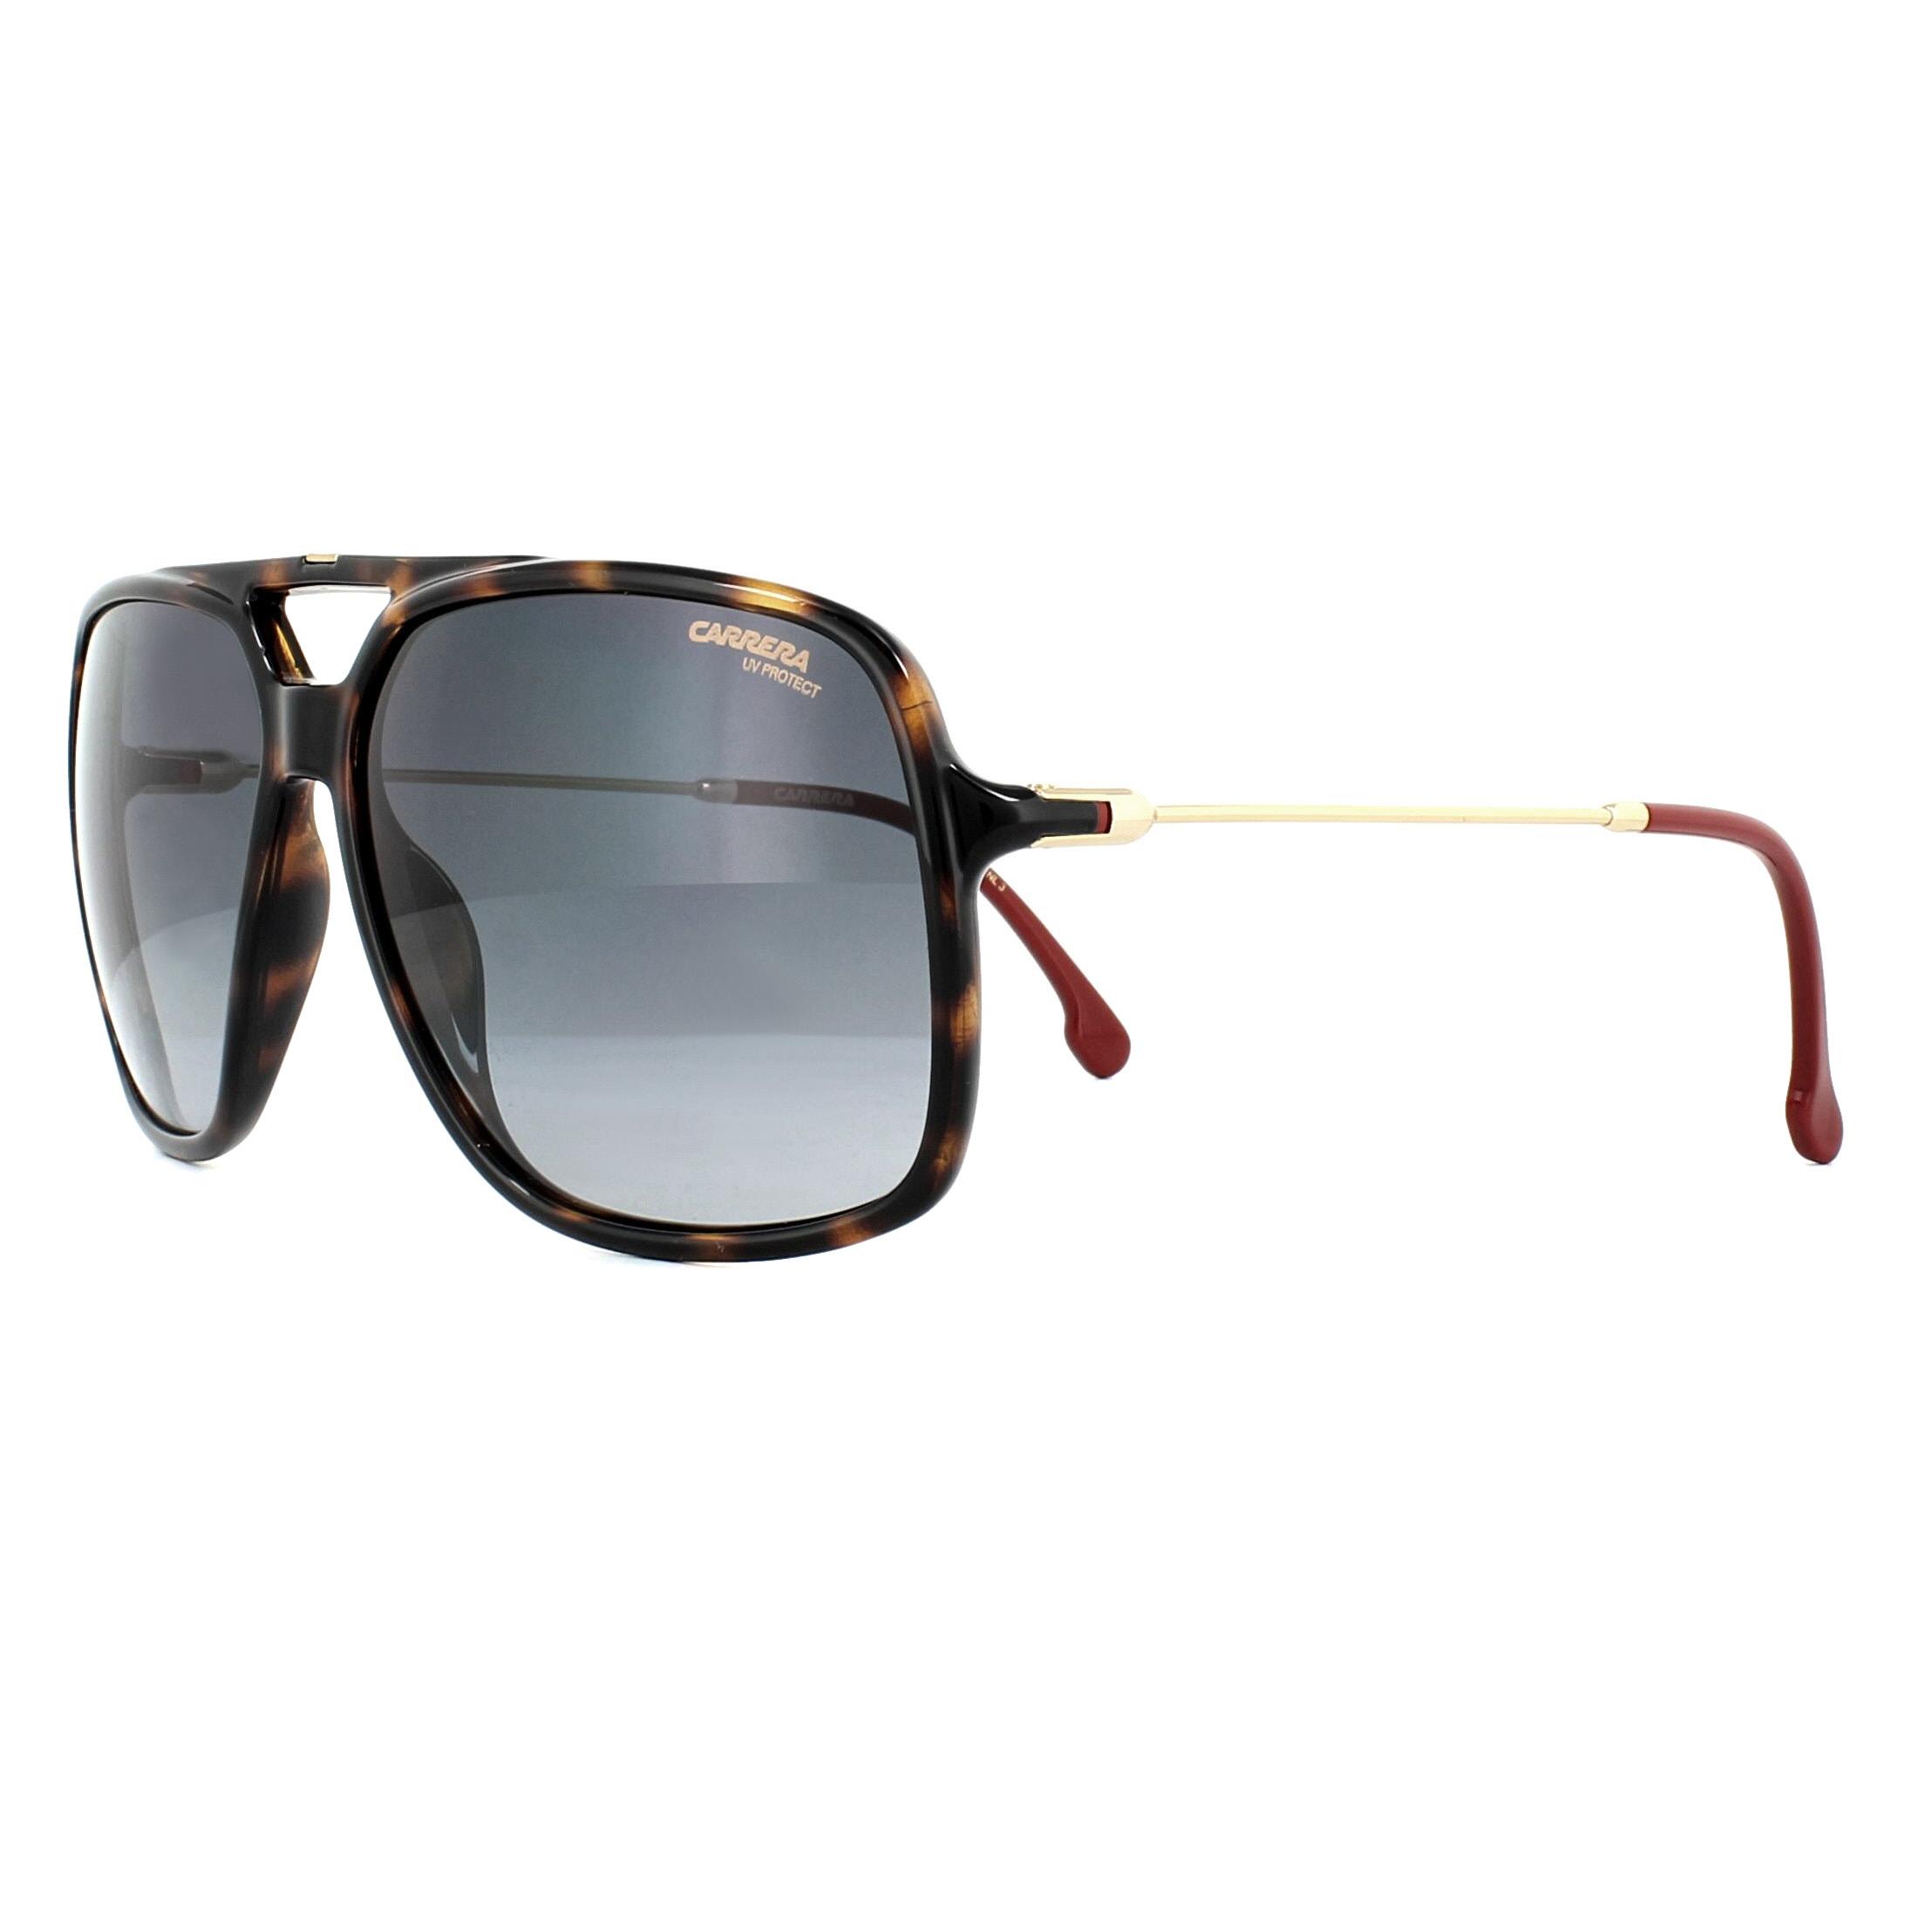 Carrera Sunglasses 155/S 086 9O Havana Gold Grey 716736032030 | eBay